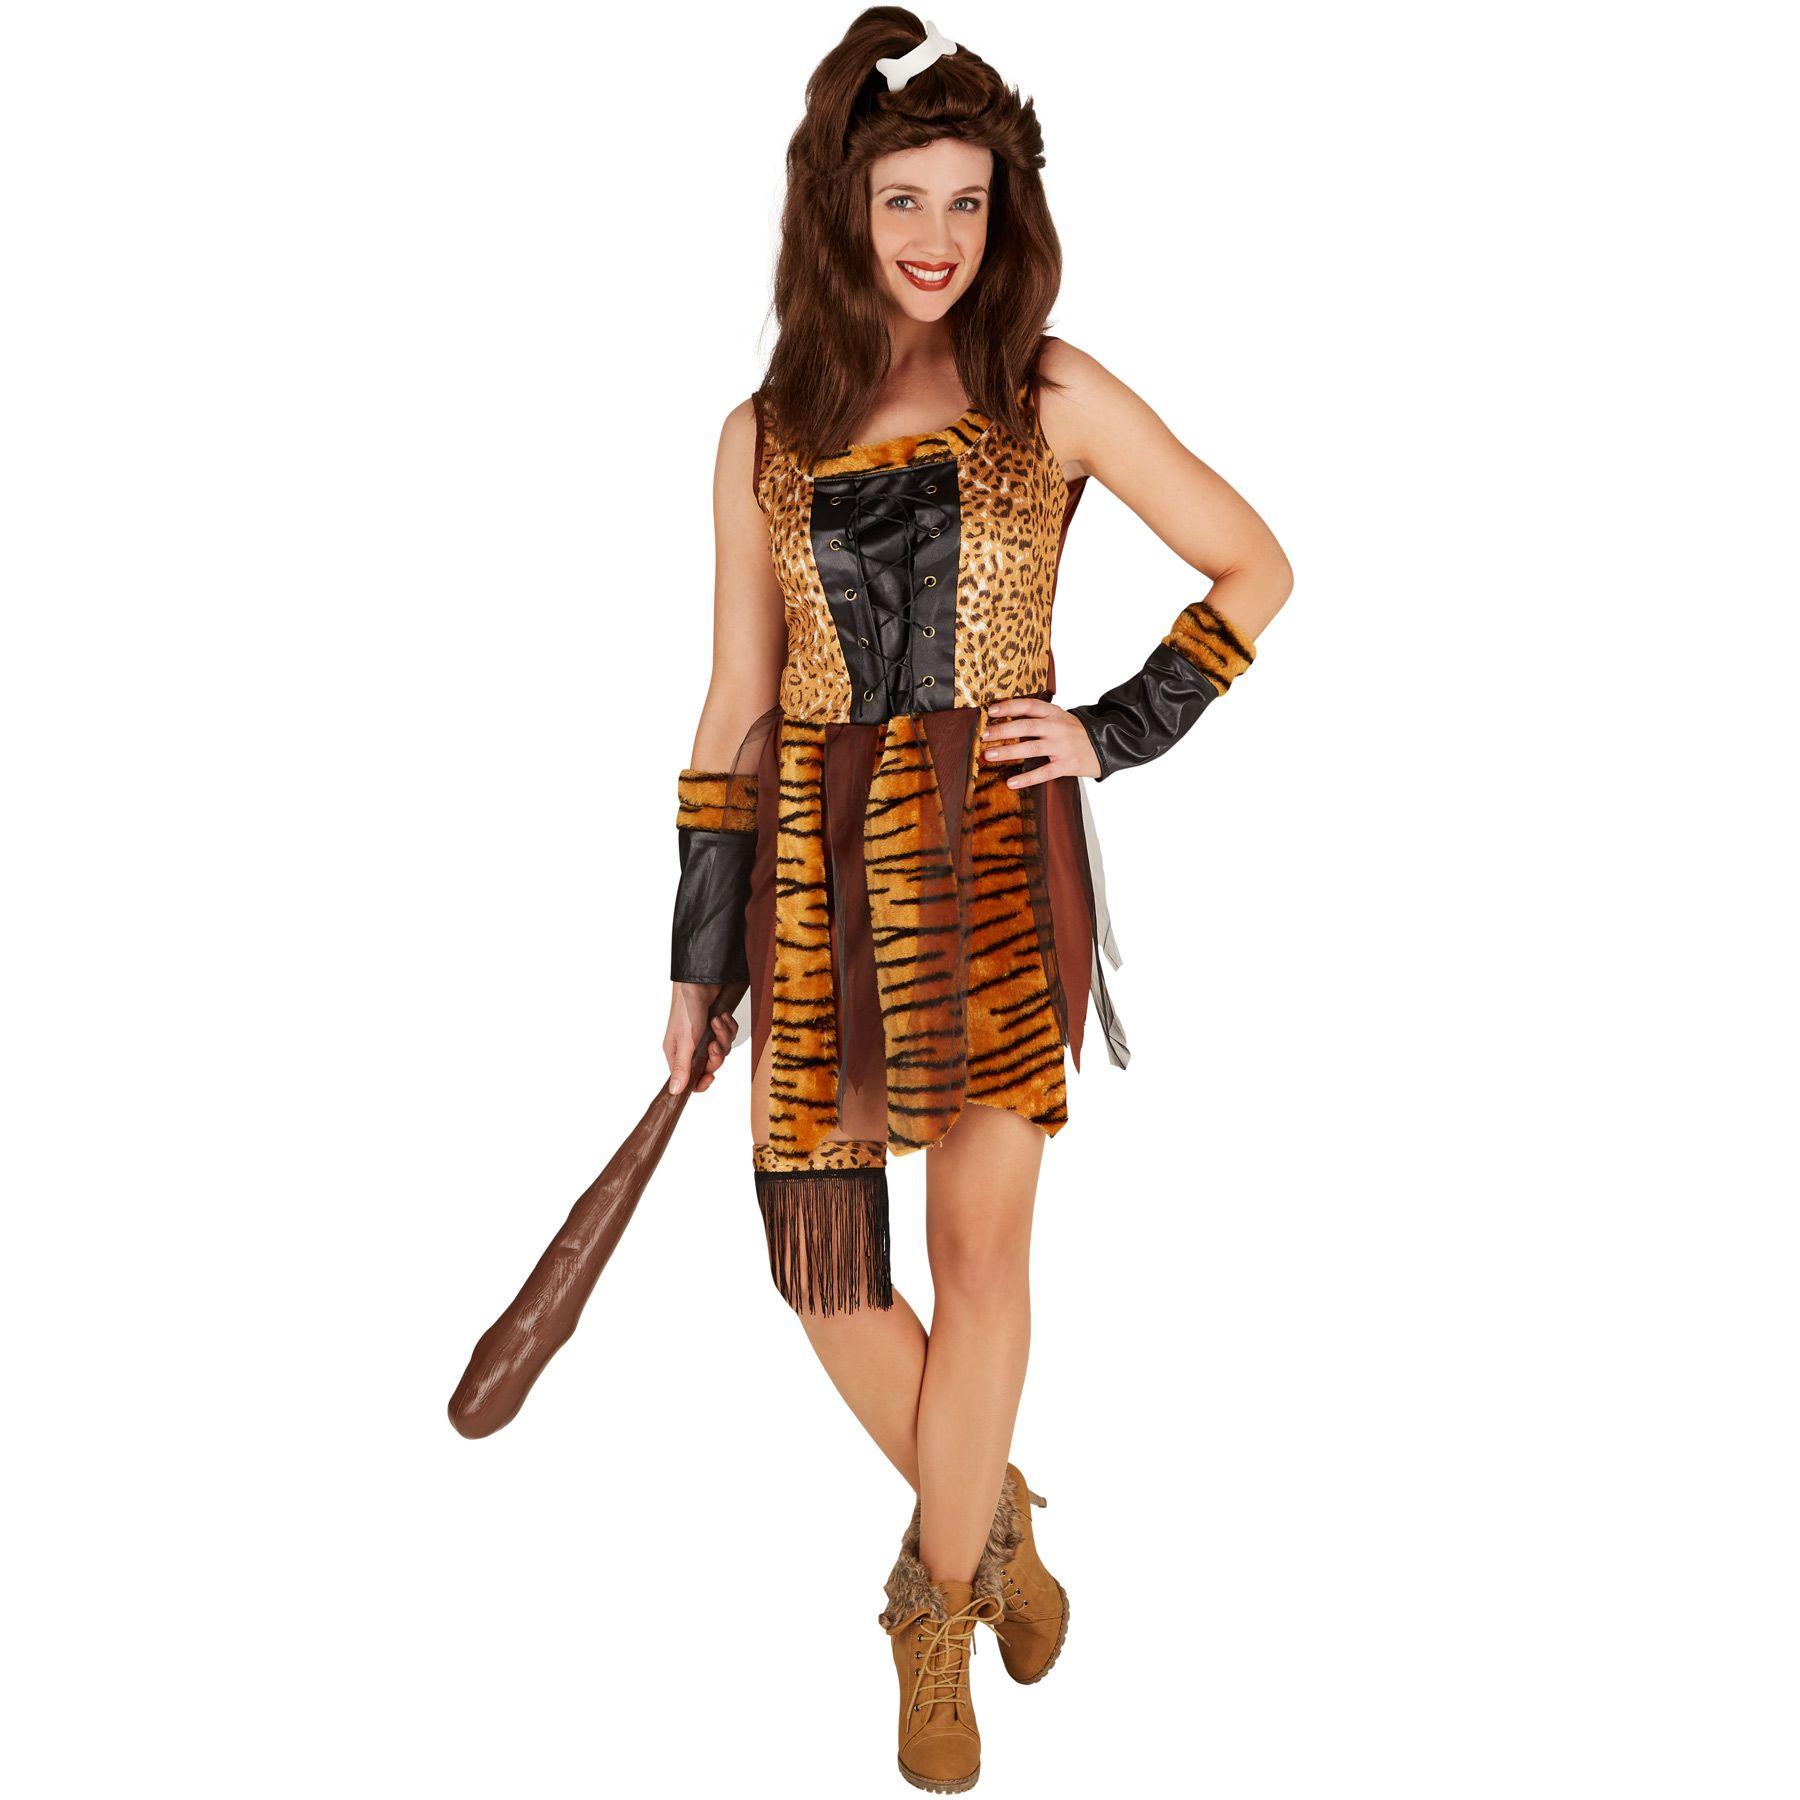 NUOVO Donna Caverne Costume